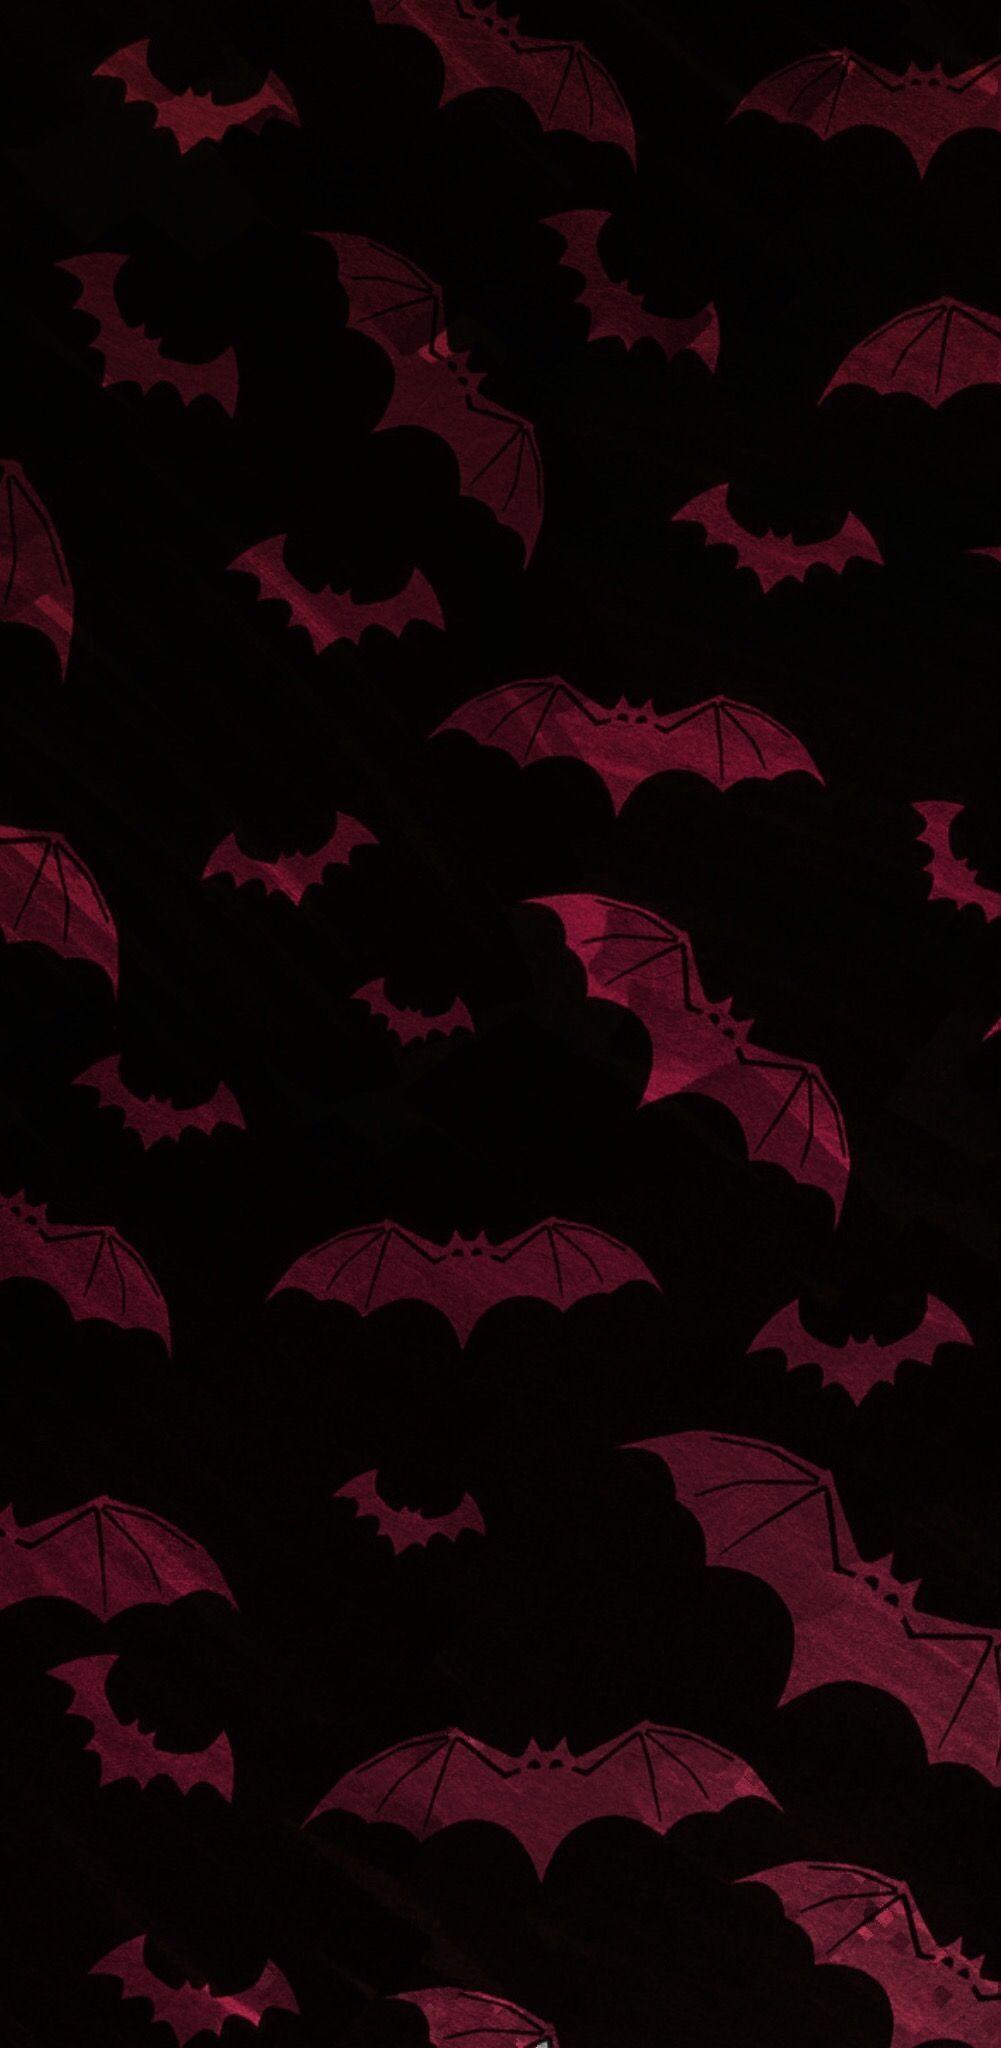 Bats Bats Wallpaper Hd Halloween Images Of Bats Halloween Bats Wallpaper Halloween Desktop Wallpaper Spooky Background Free Halloween Wallpaper